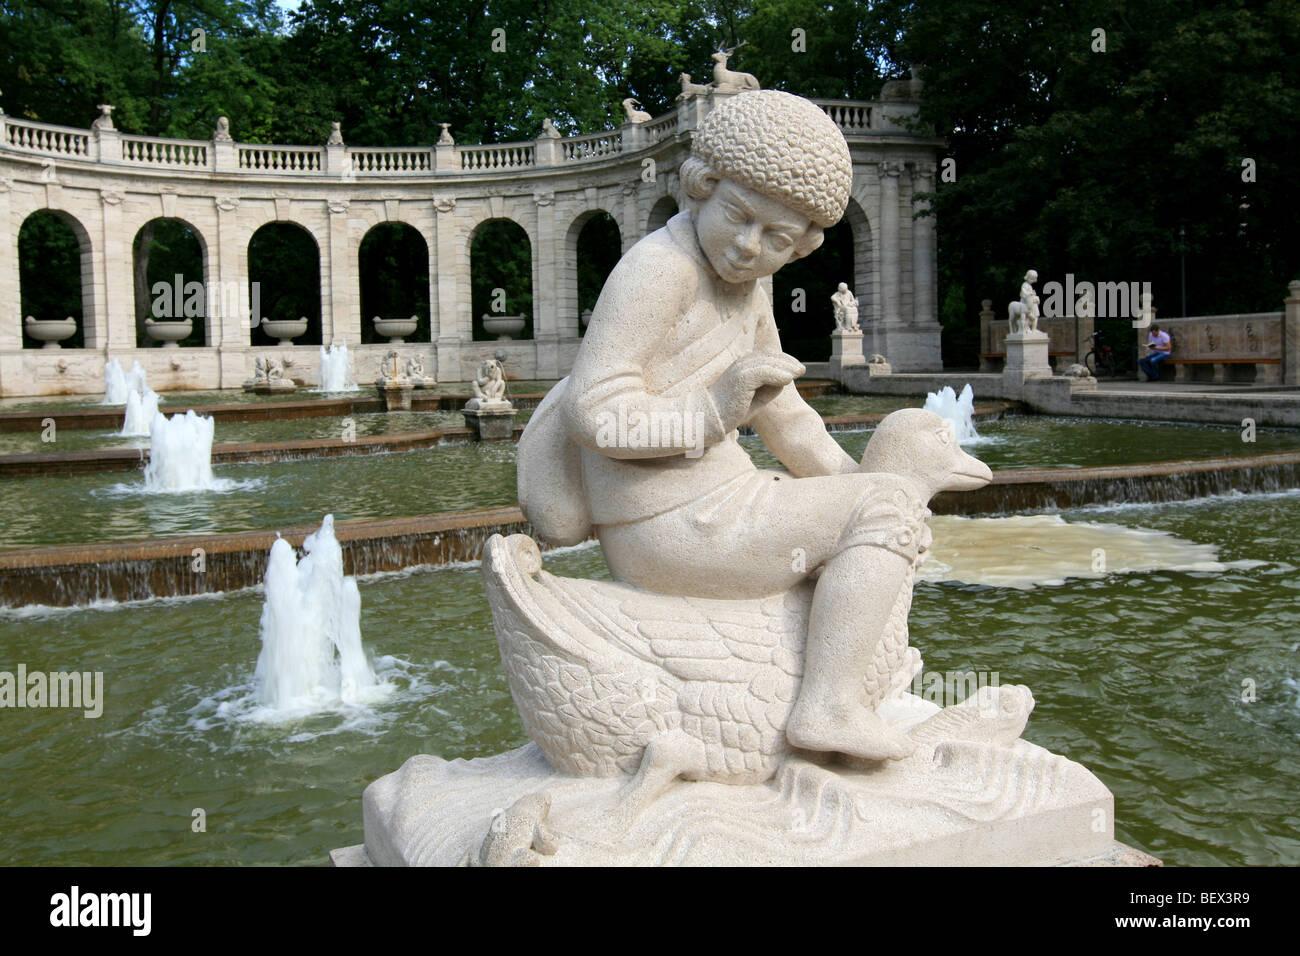 Fountain of Fairy Tales, Volkspark Friedrichshain, Berlin - Stock Image